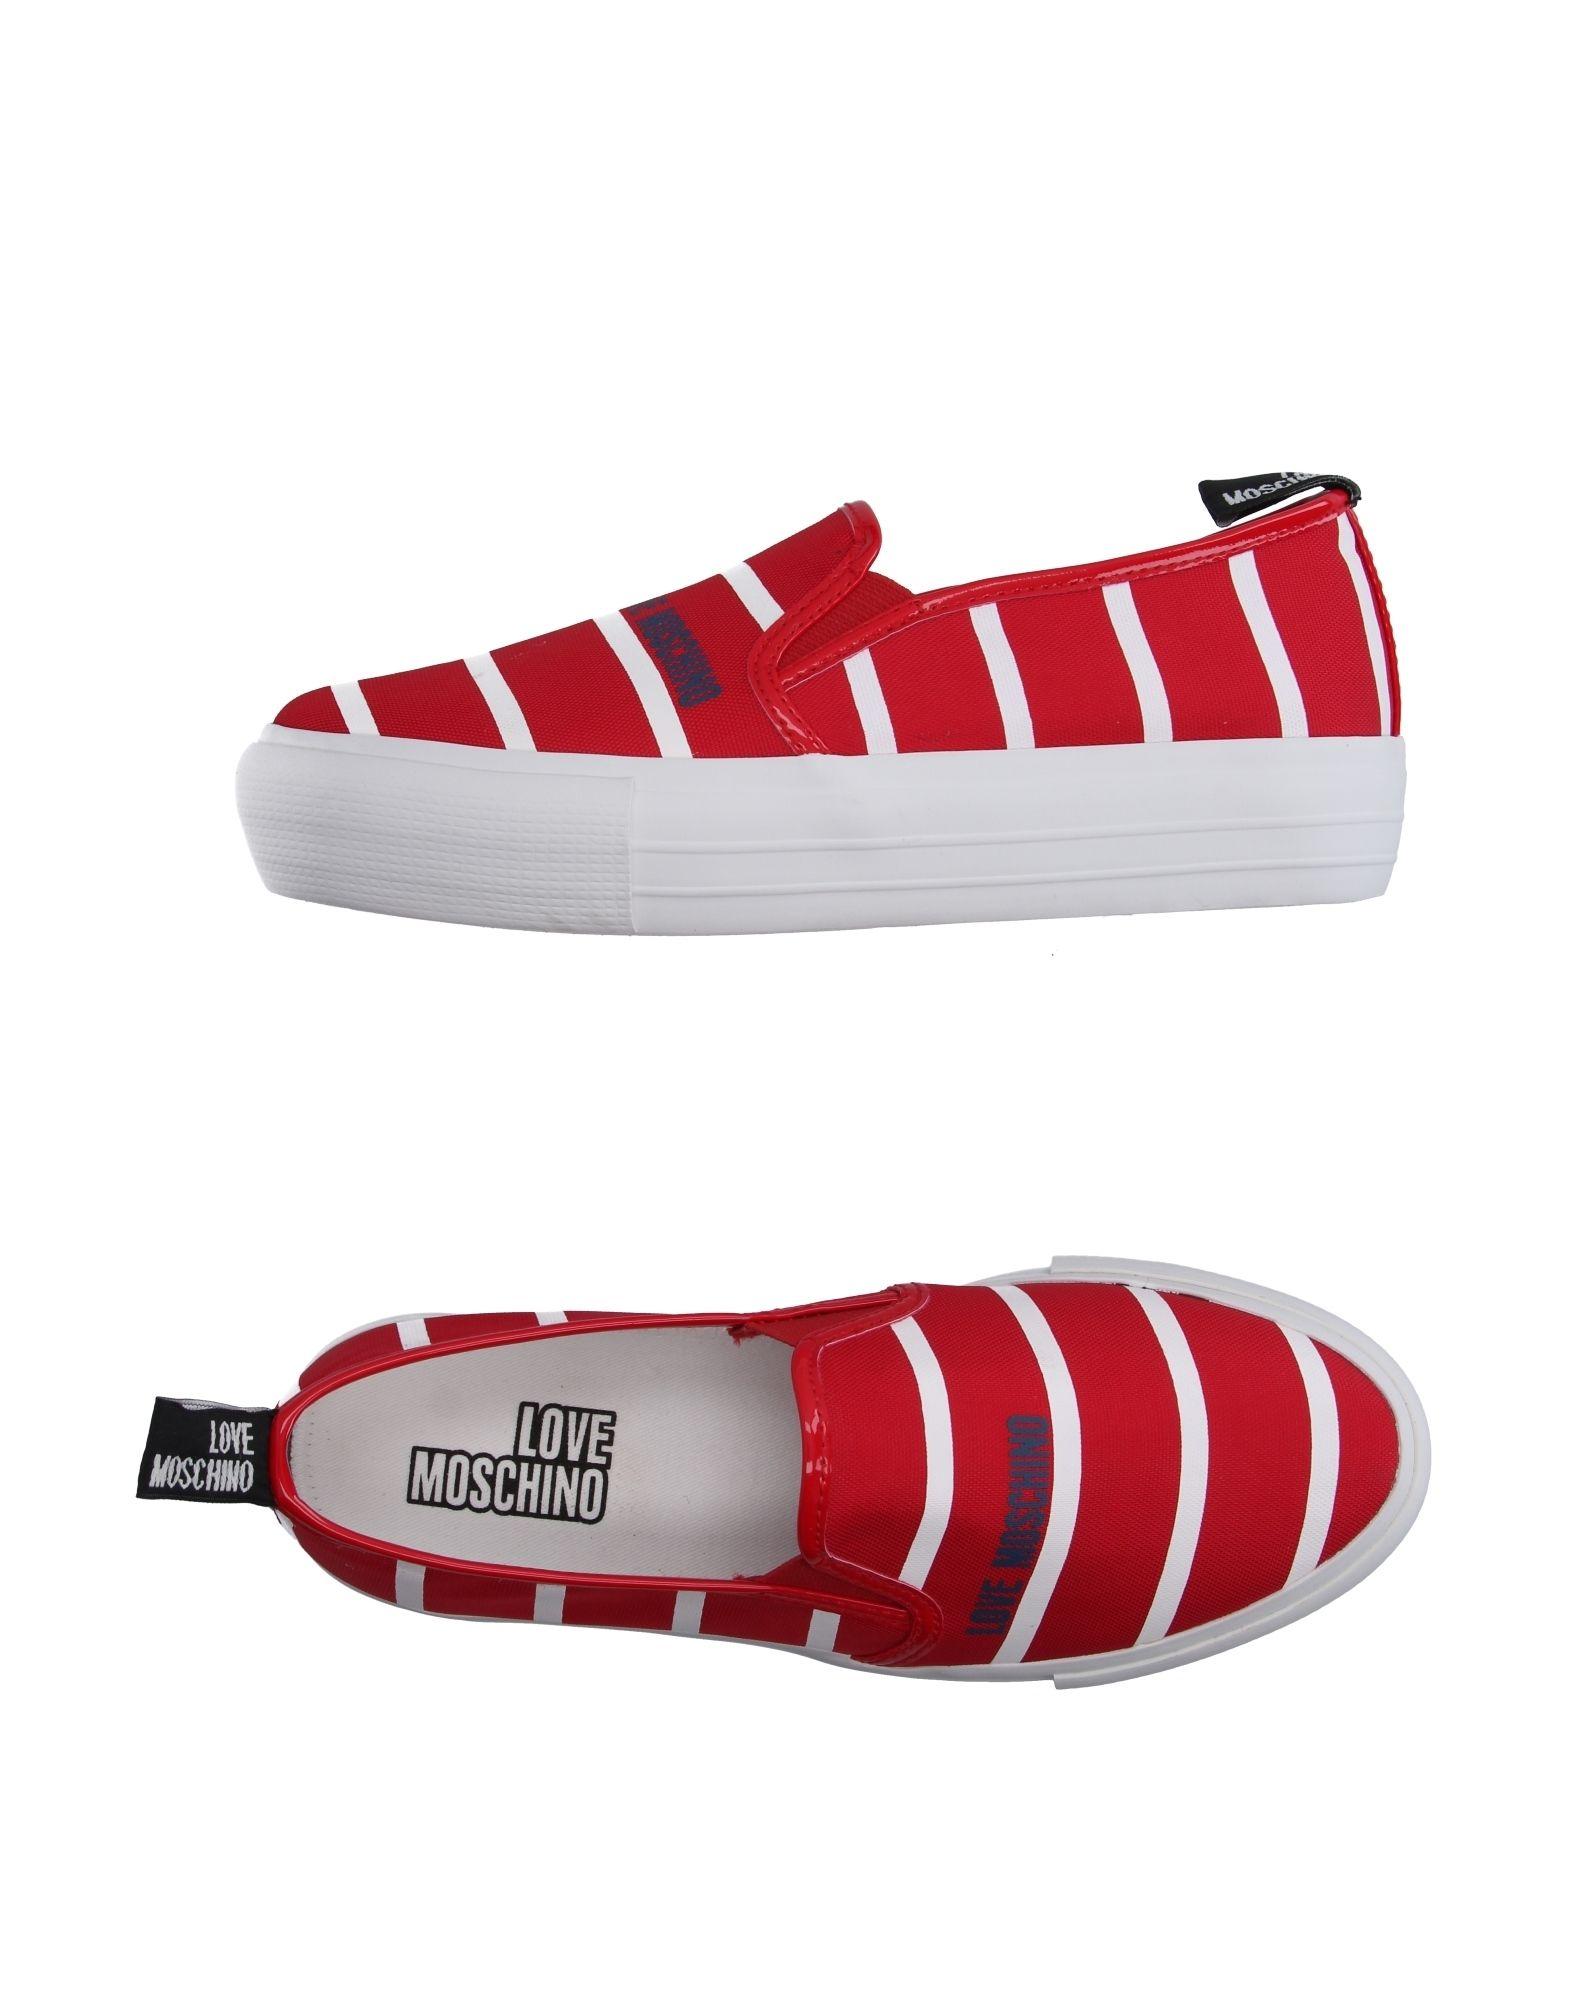 Love Moschino Sneakers Damen  11139532JE Gute Qualität beliebte Schuhe